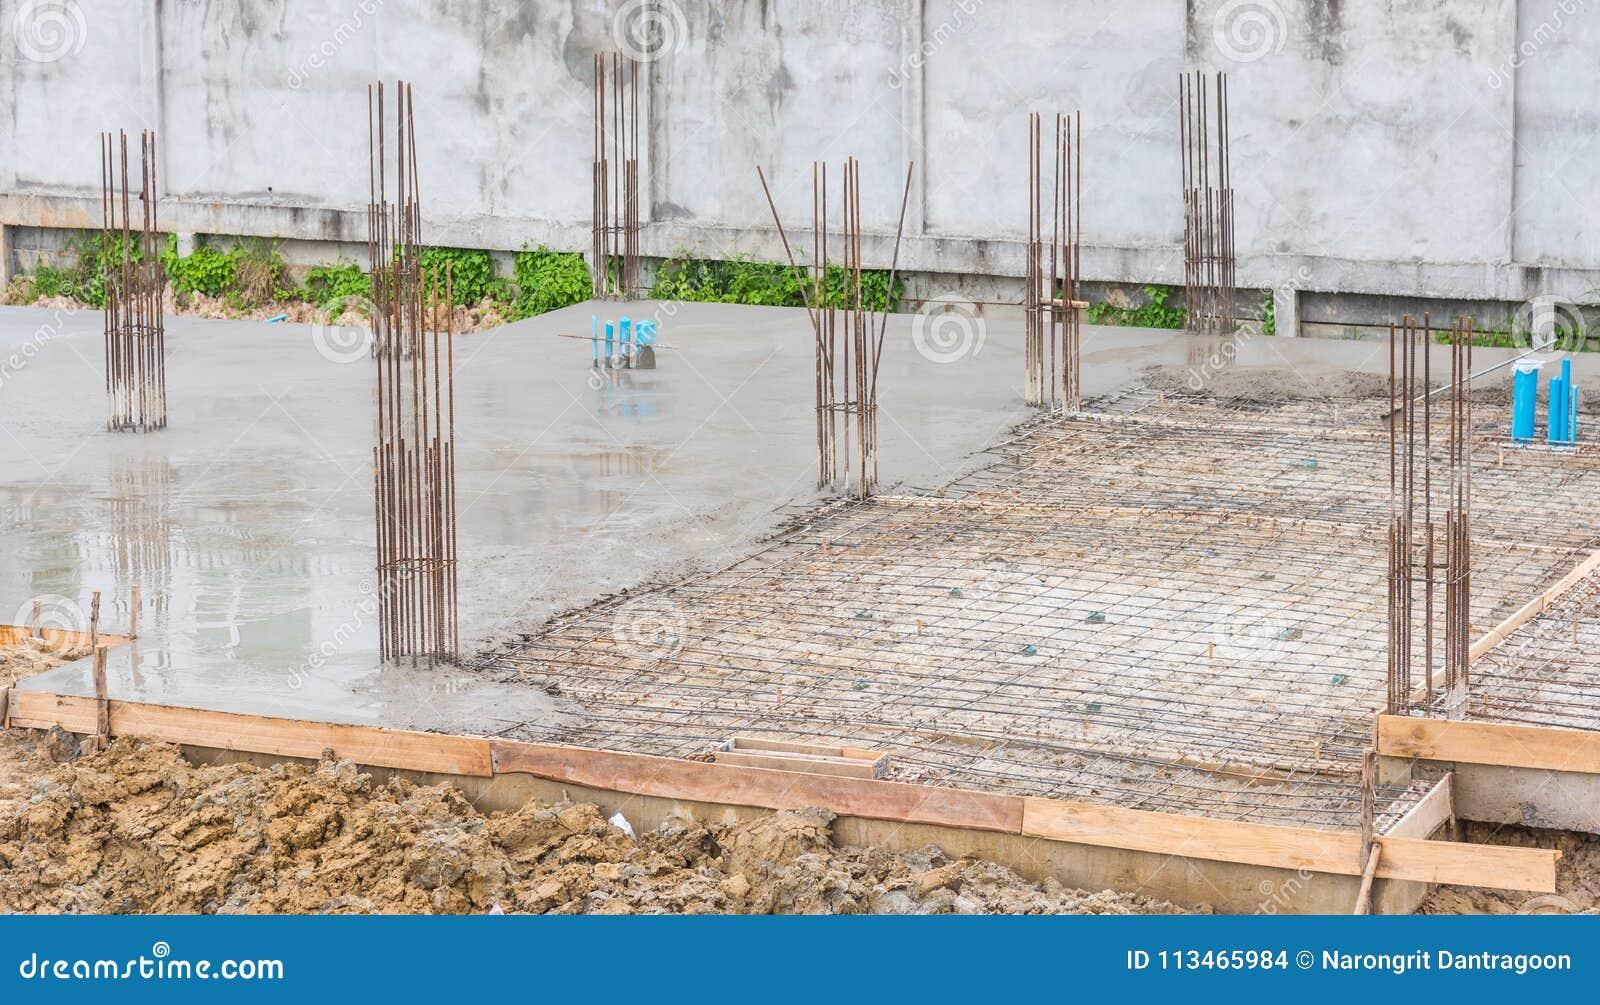 Basement Building Under Construction Stock Photo Image Of Construction Column 113465984